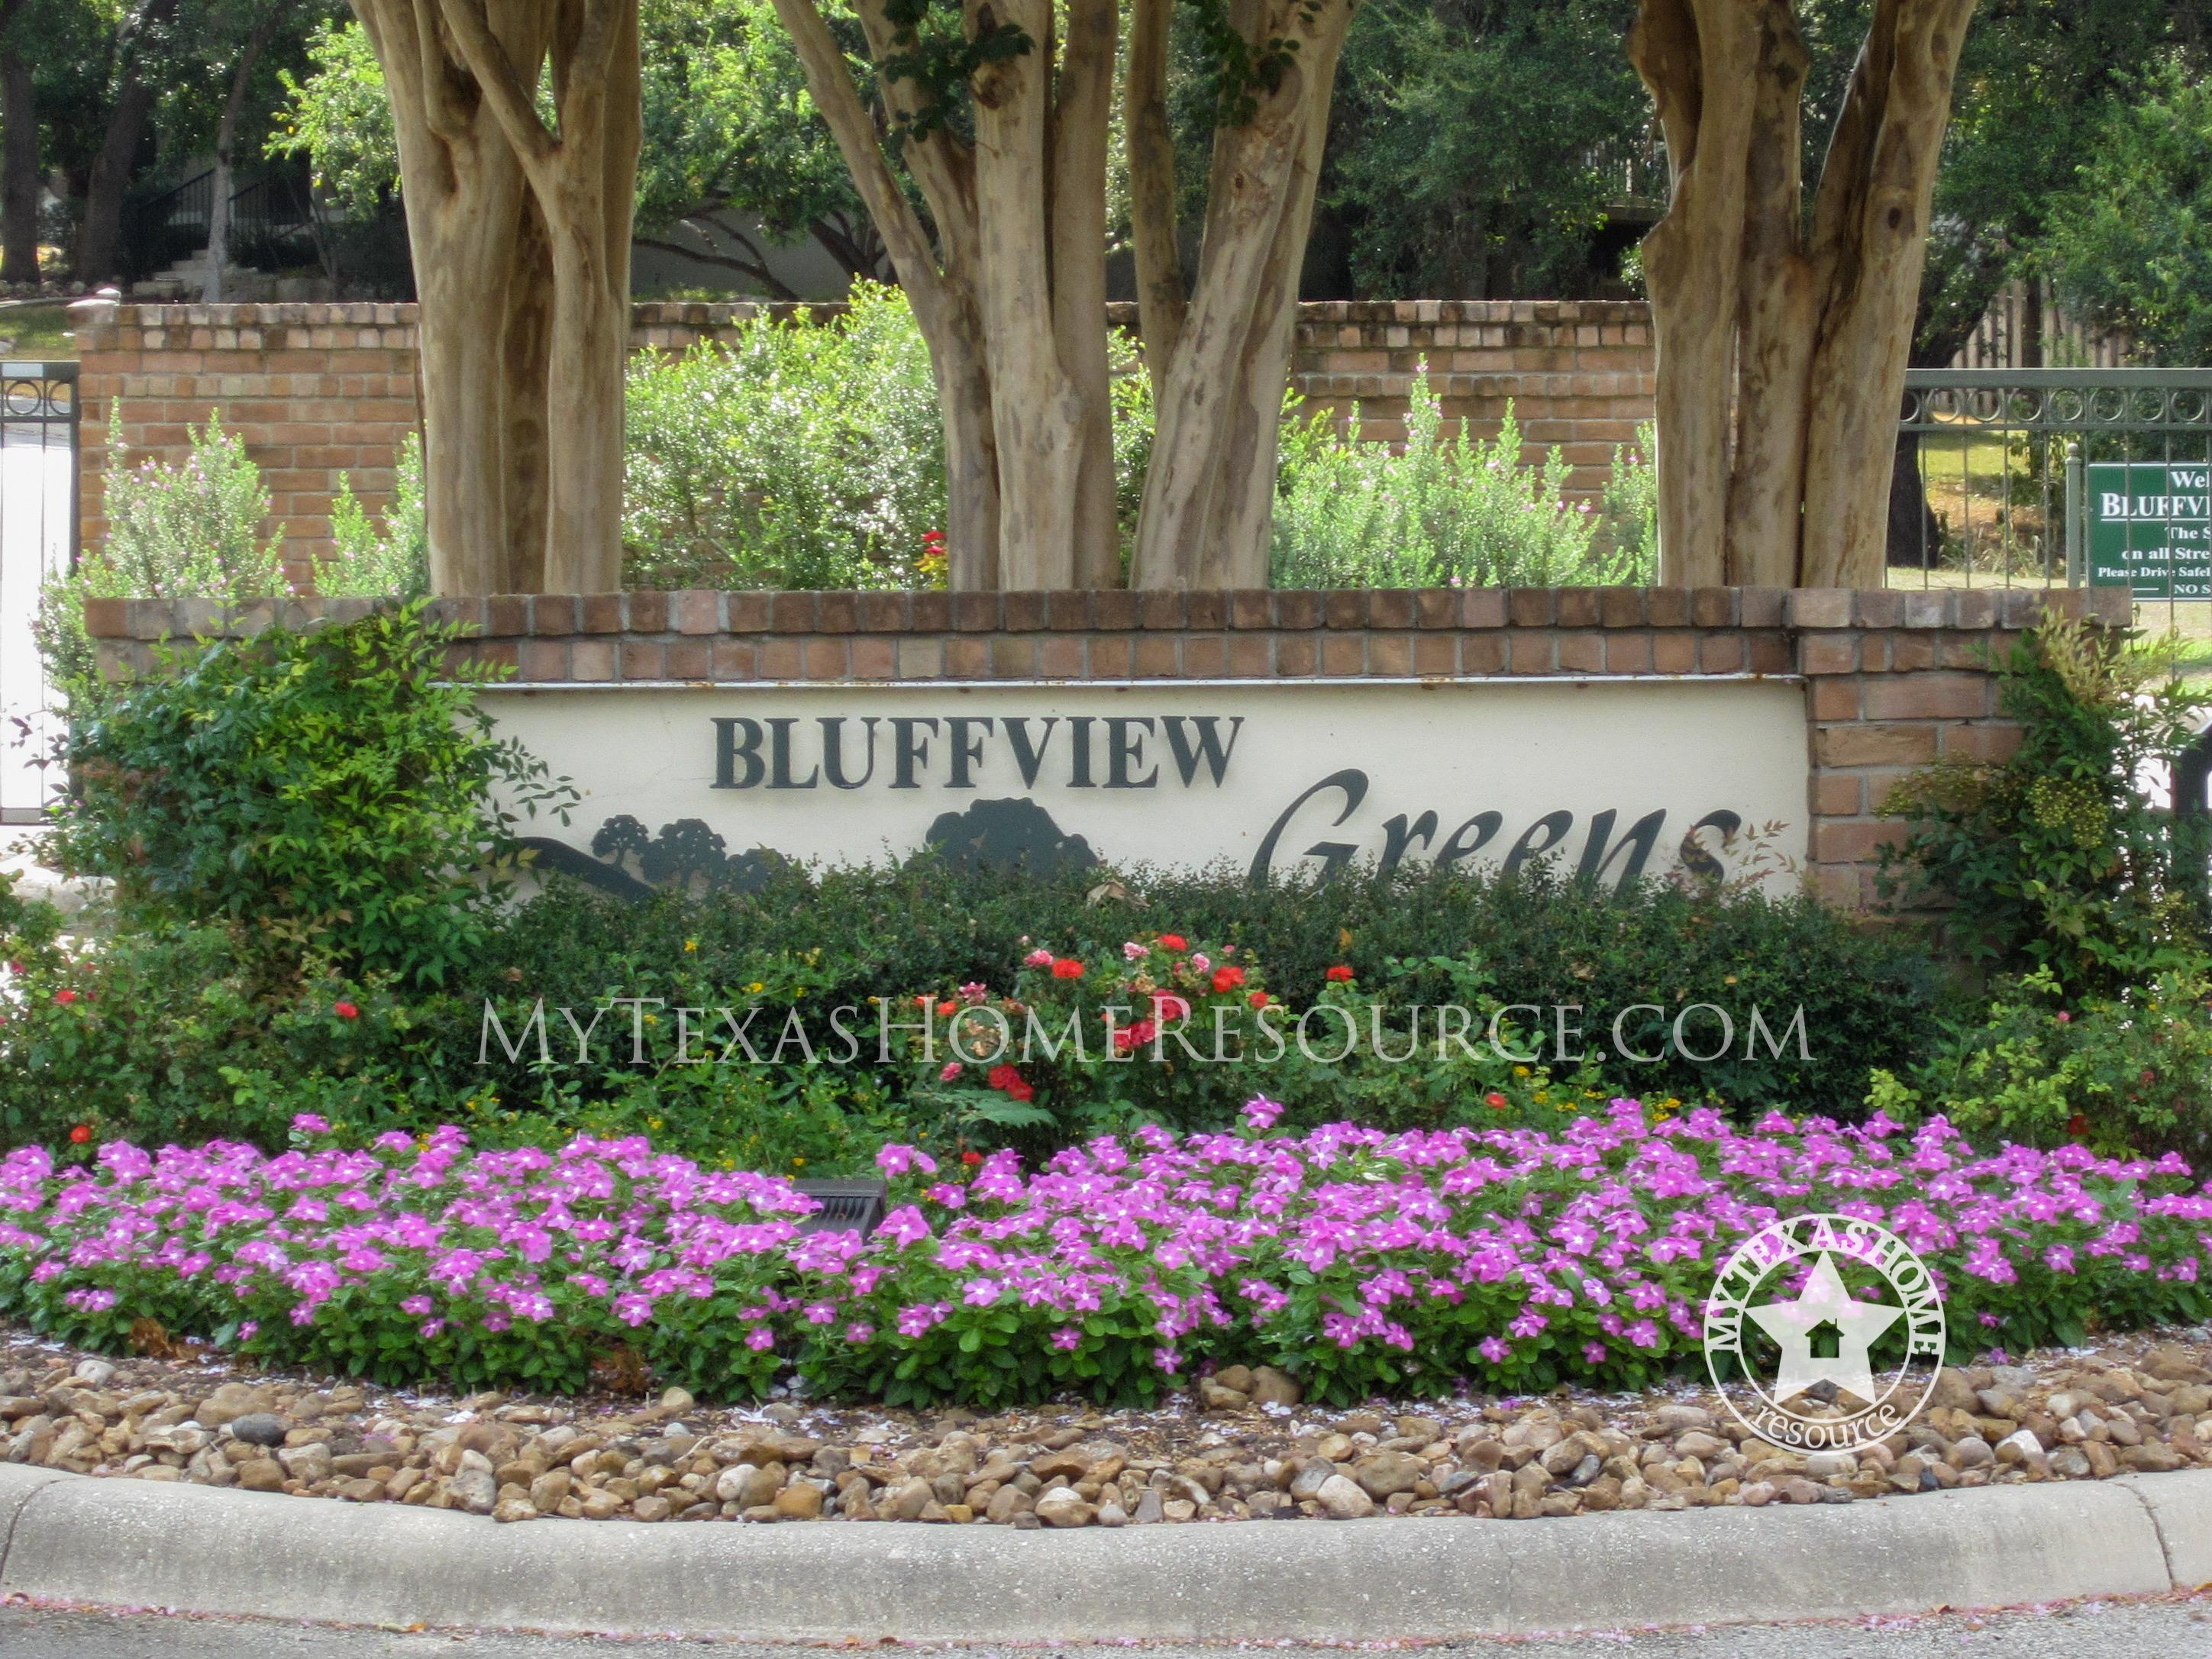 Bluffview Greens Community